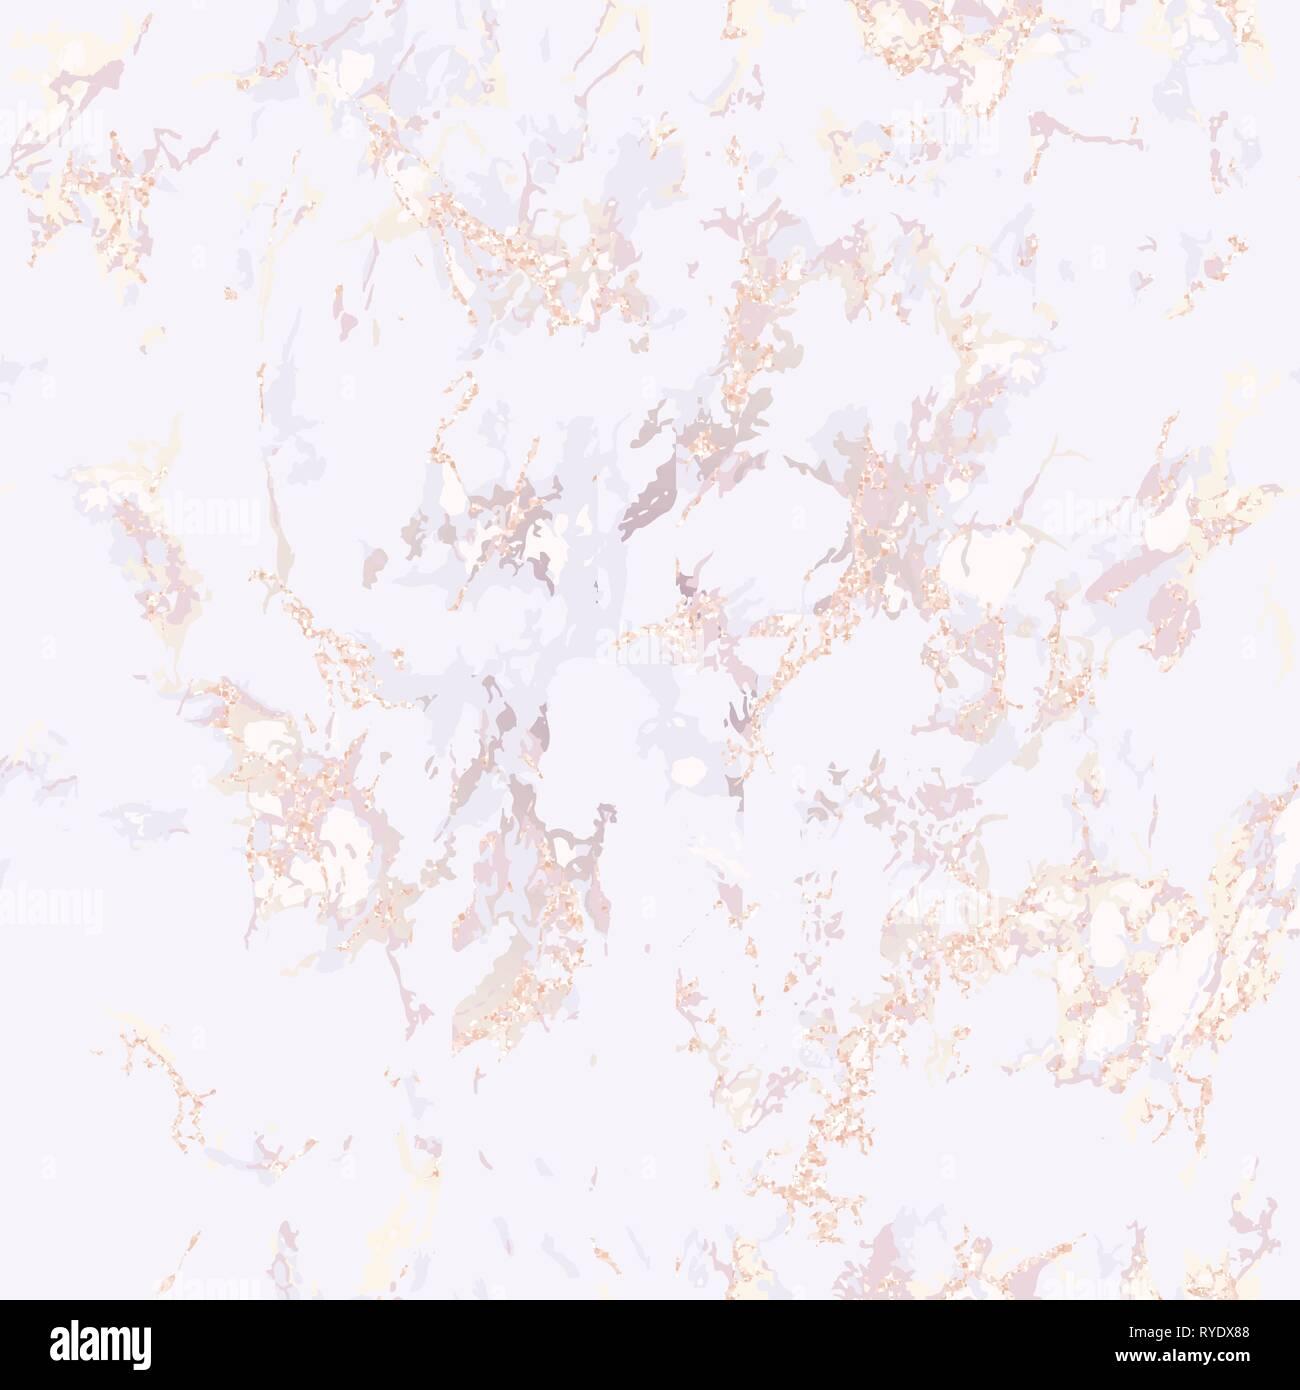 Elegant Pink Marble Texture Seamless Pattern Stock Vector Image Art Alamy